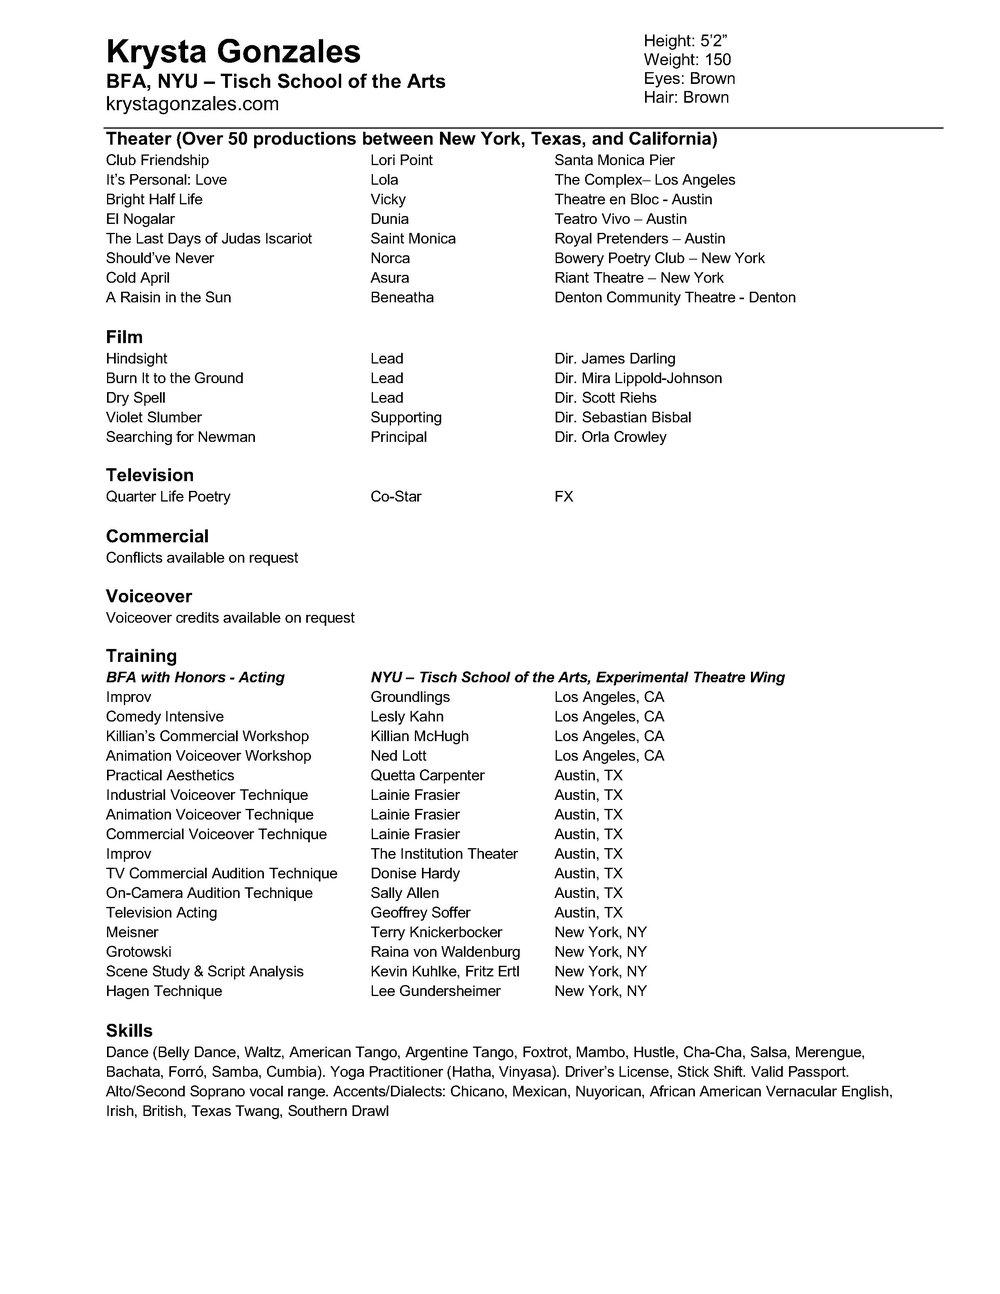 K-Gonzales-Acting-Resume.jpg